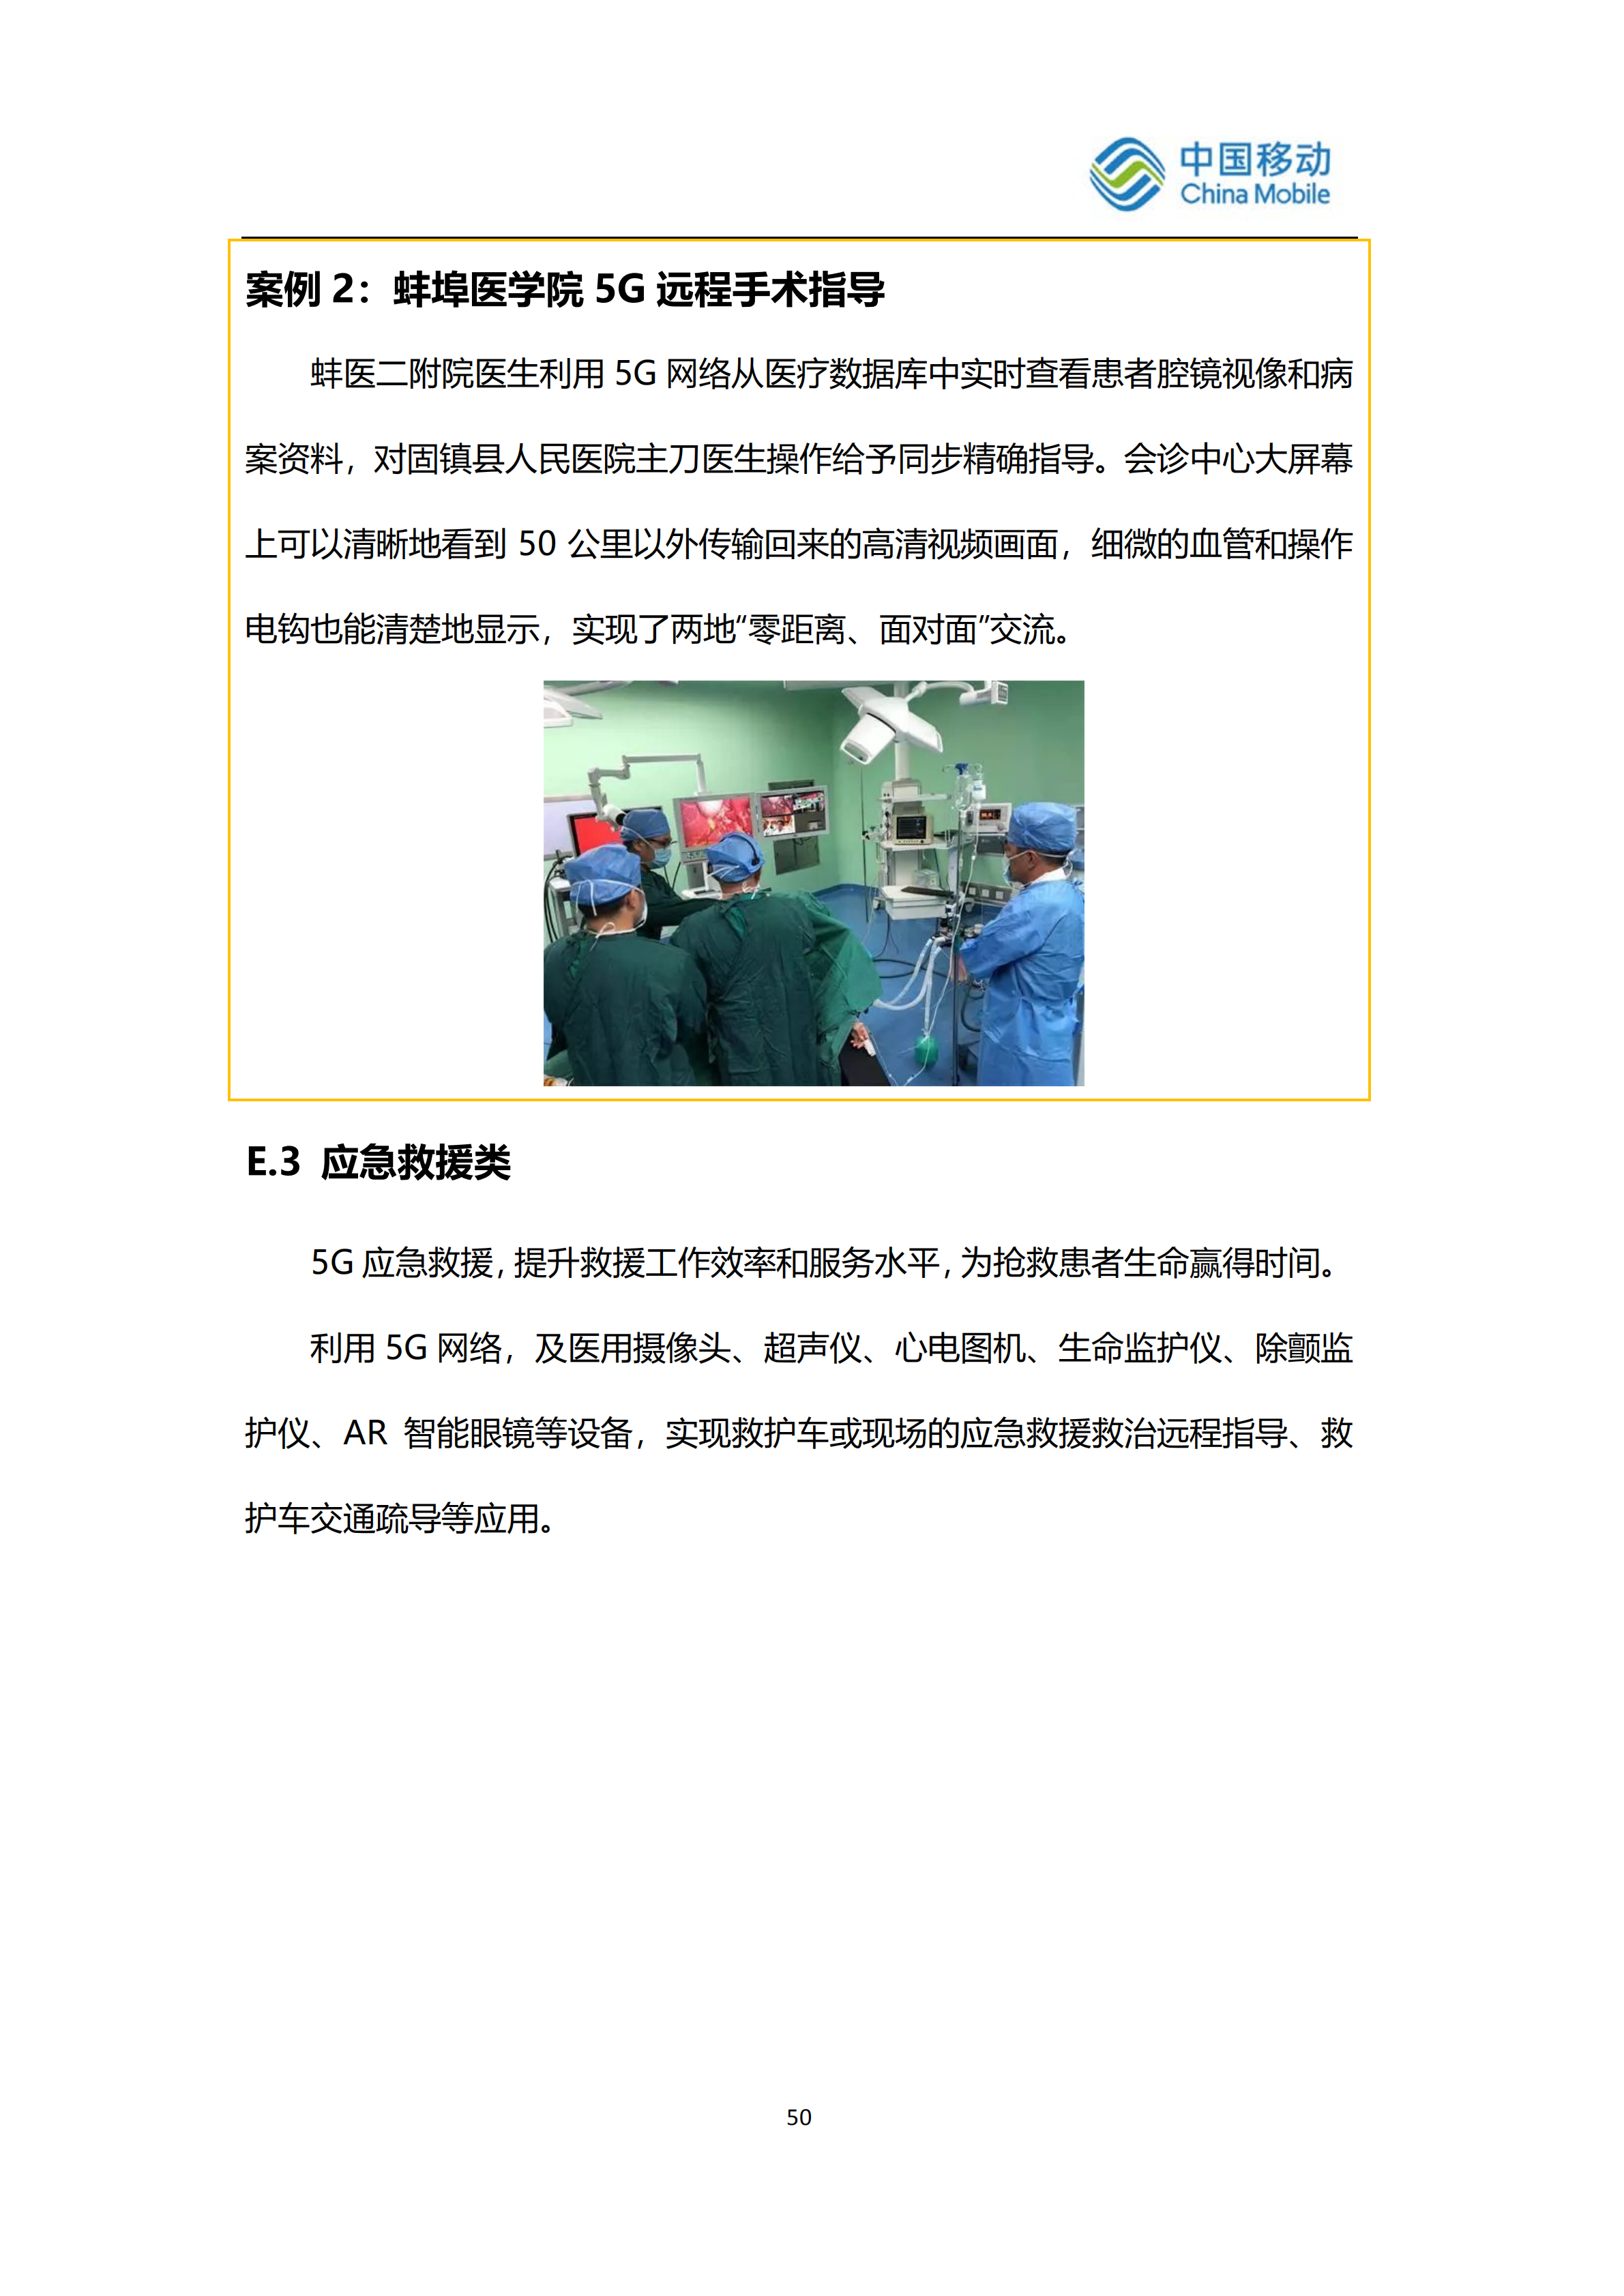 5G典型应用案例集锦_54.png